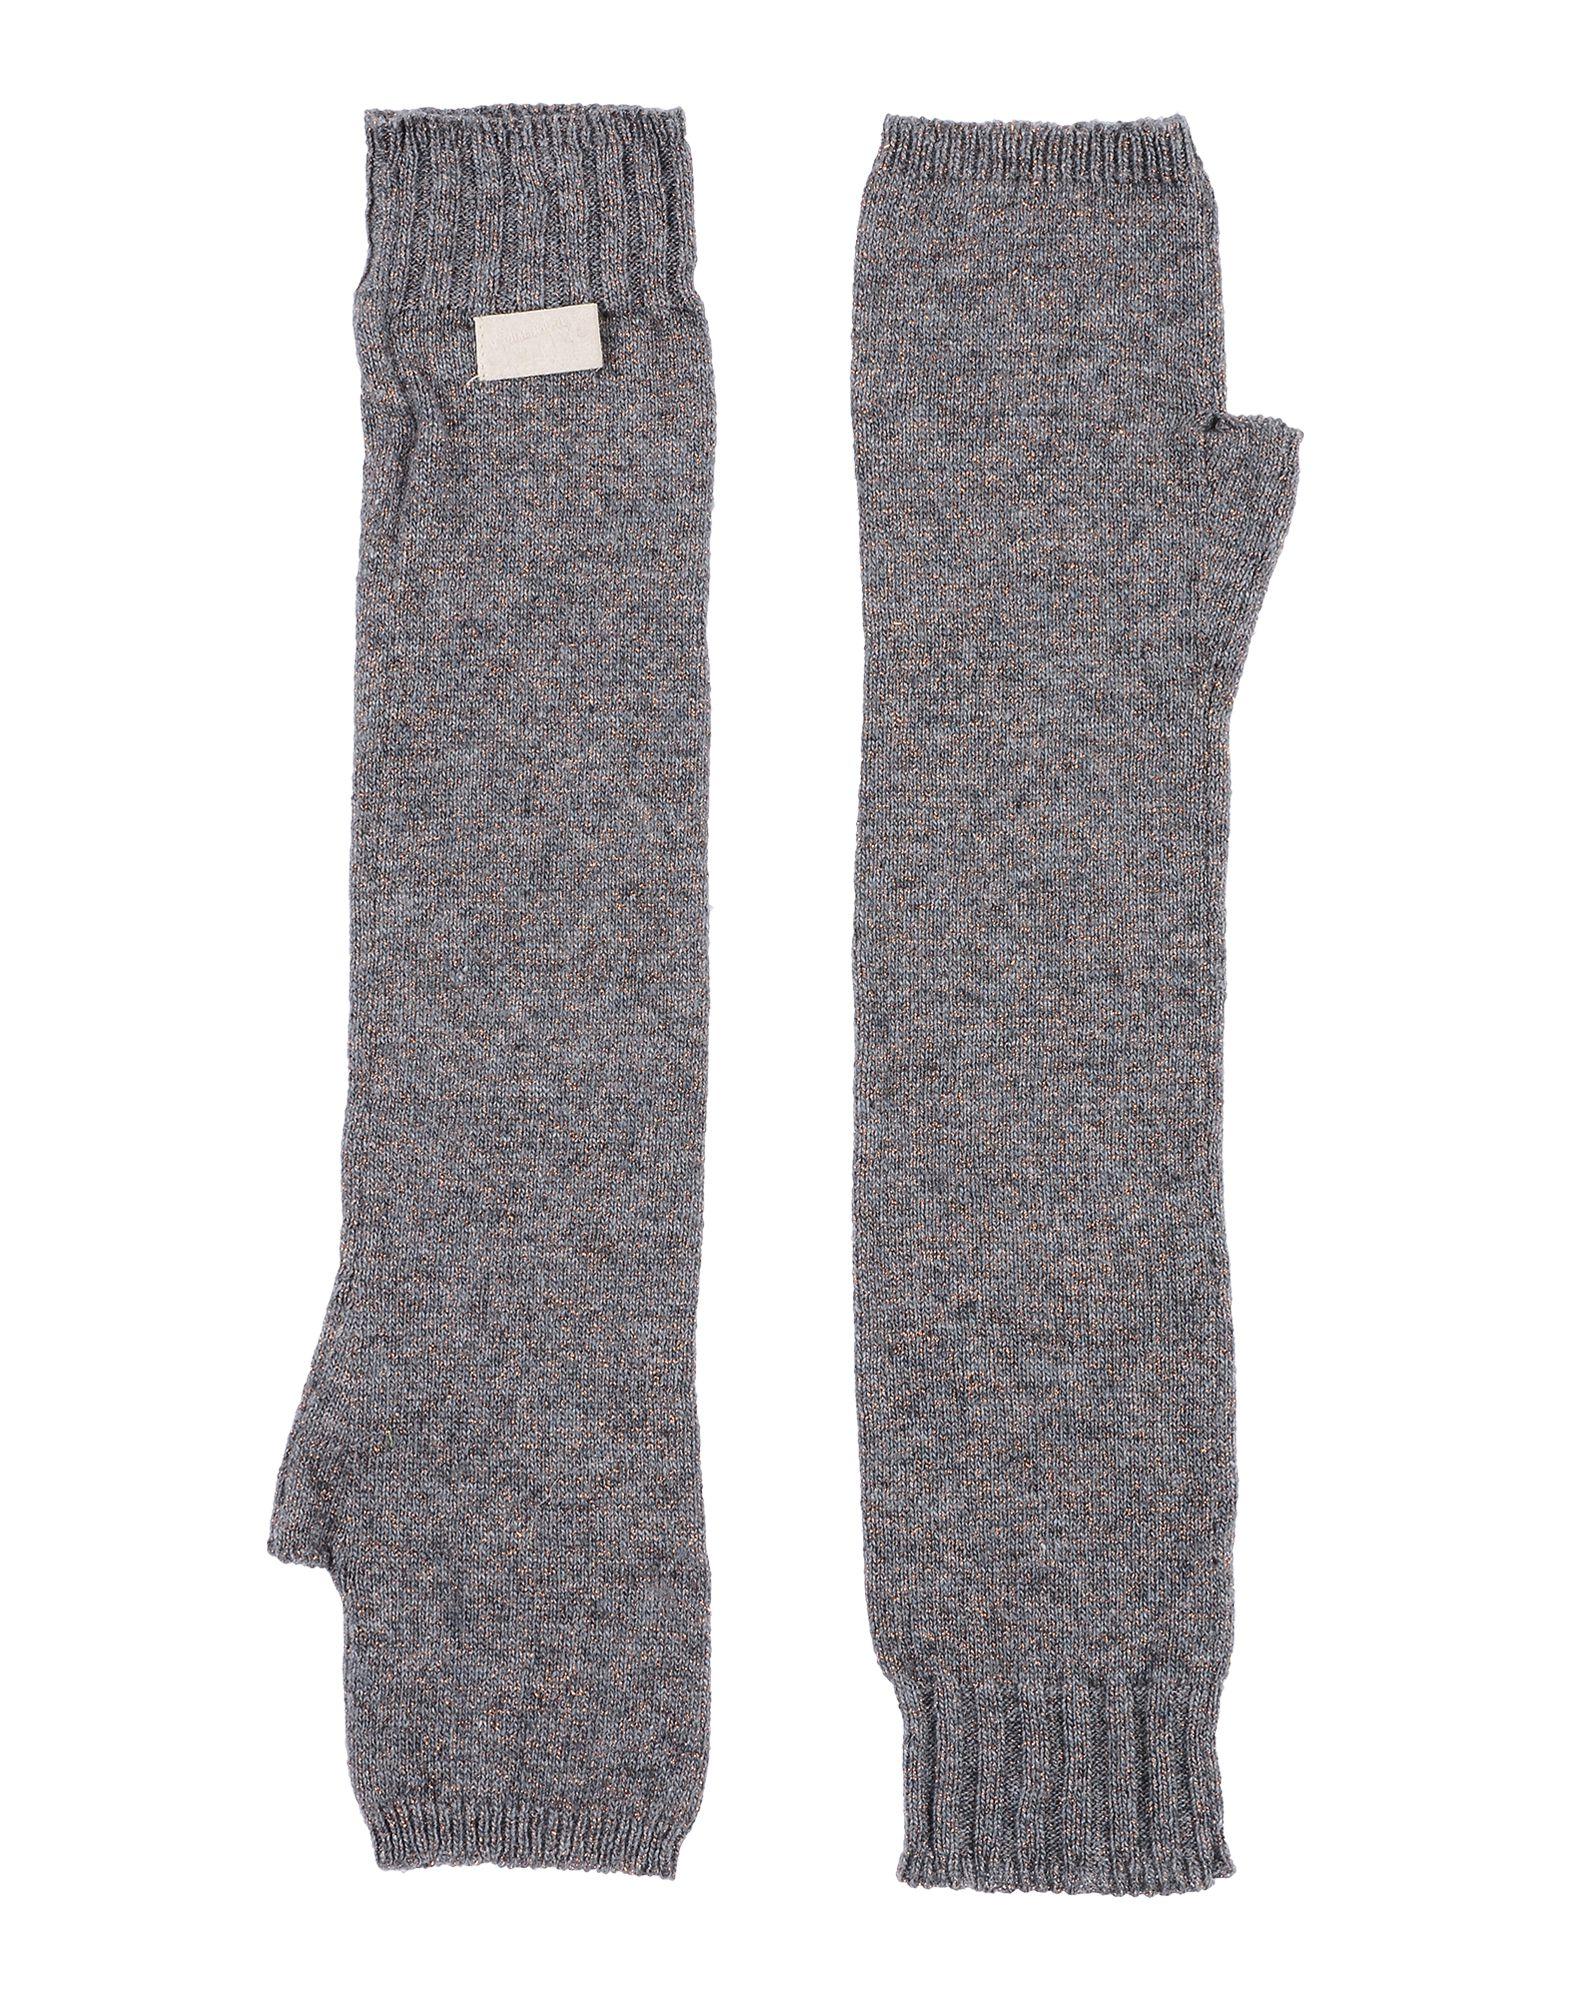 цены на DIMENSIONE DANZA Перчатки  в интернет-магазинах